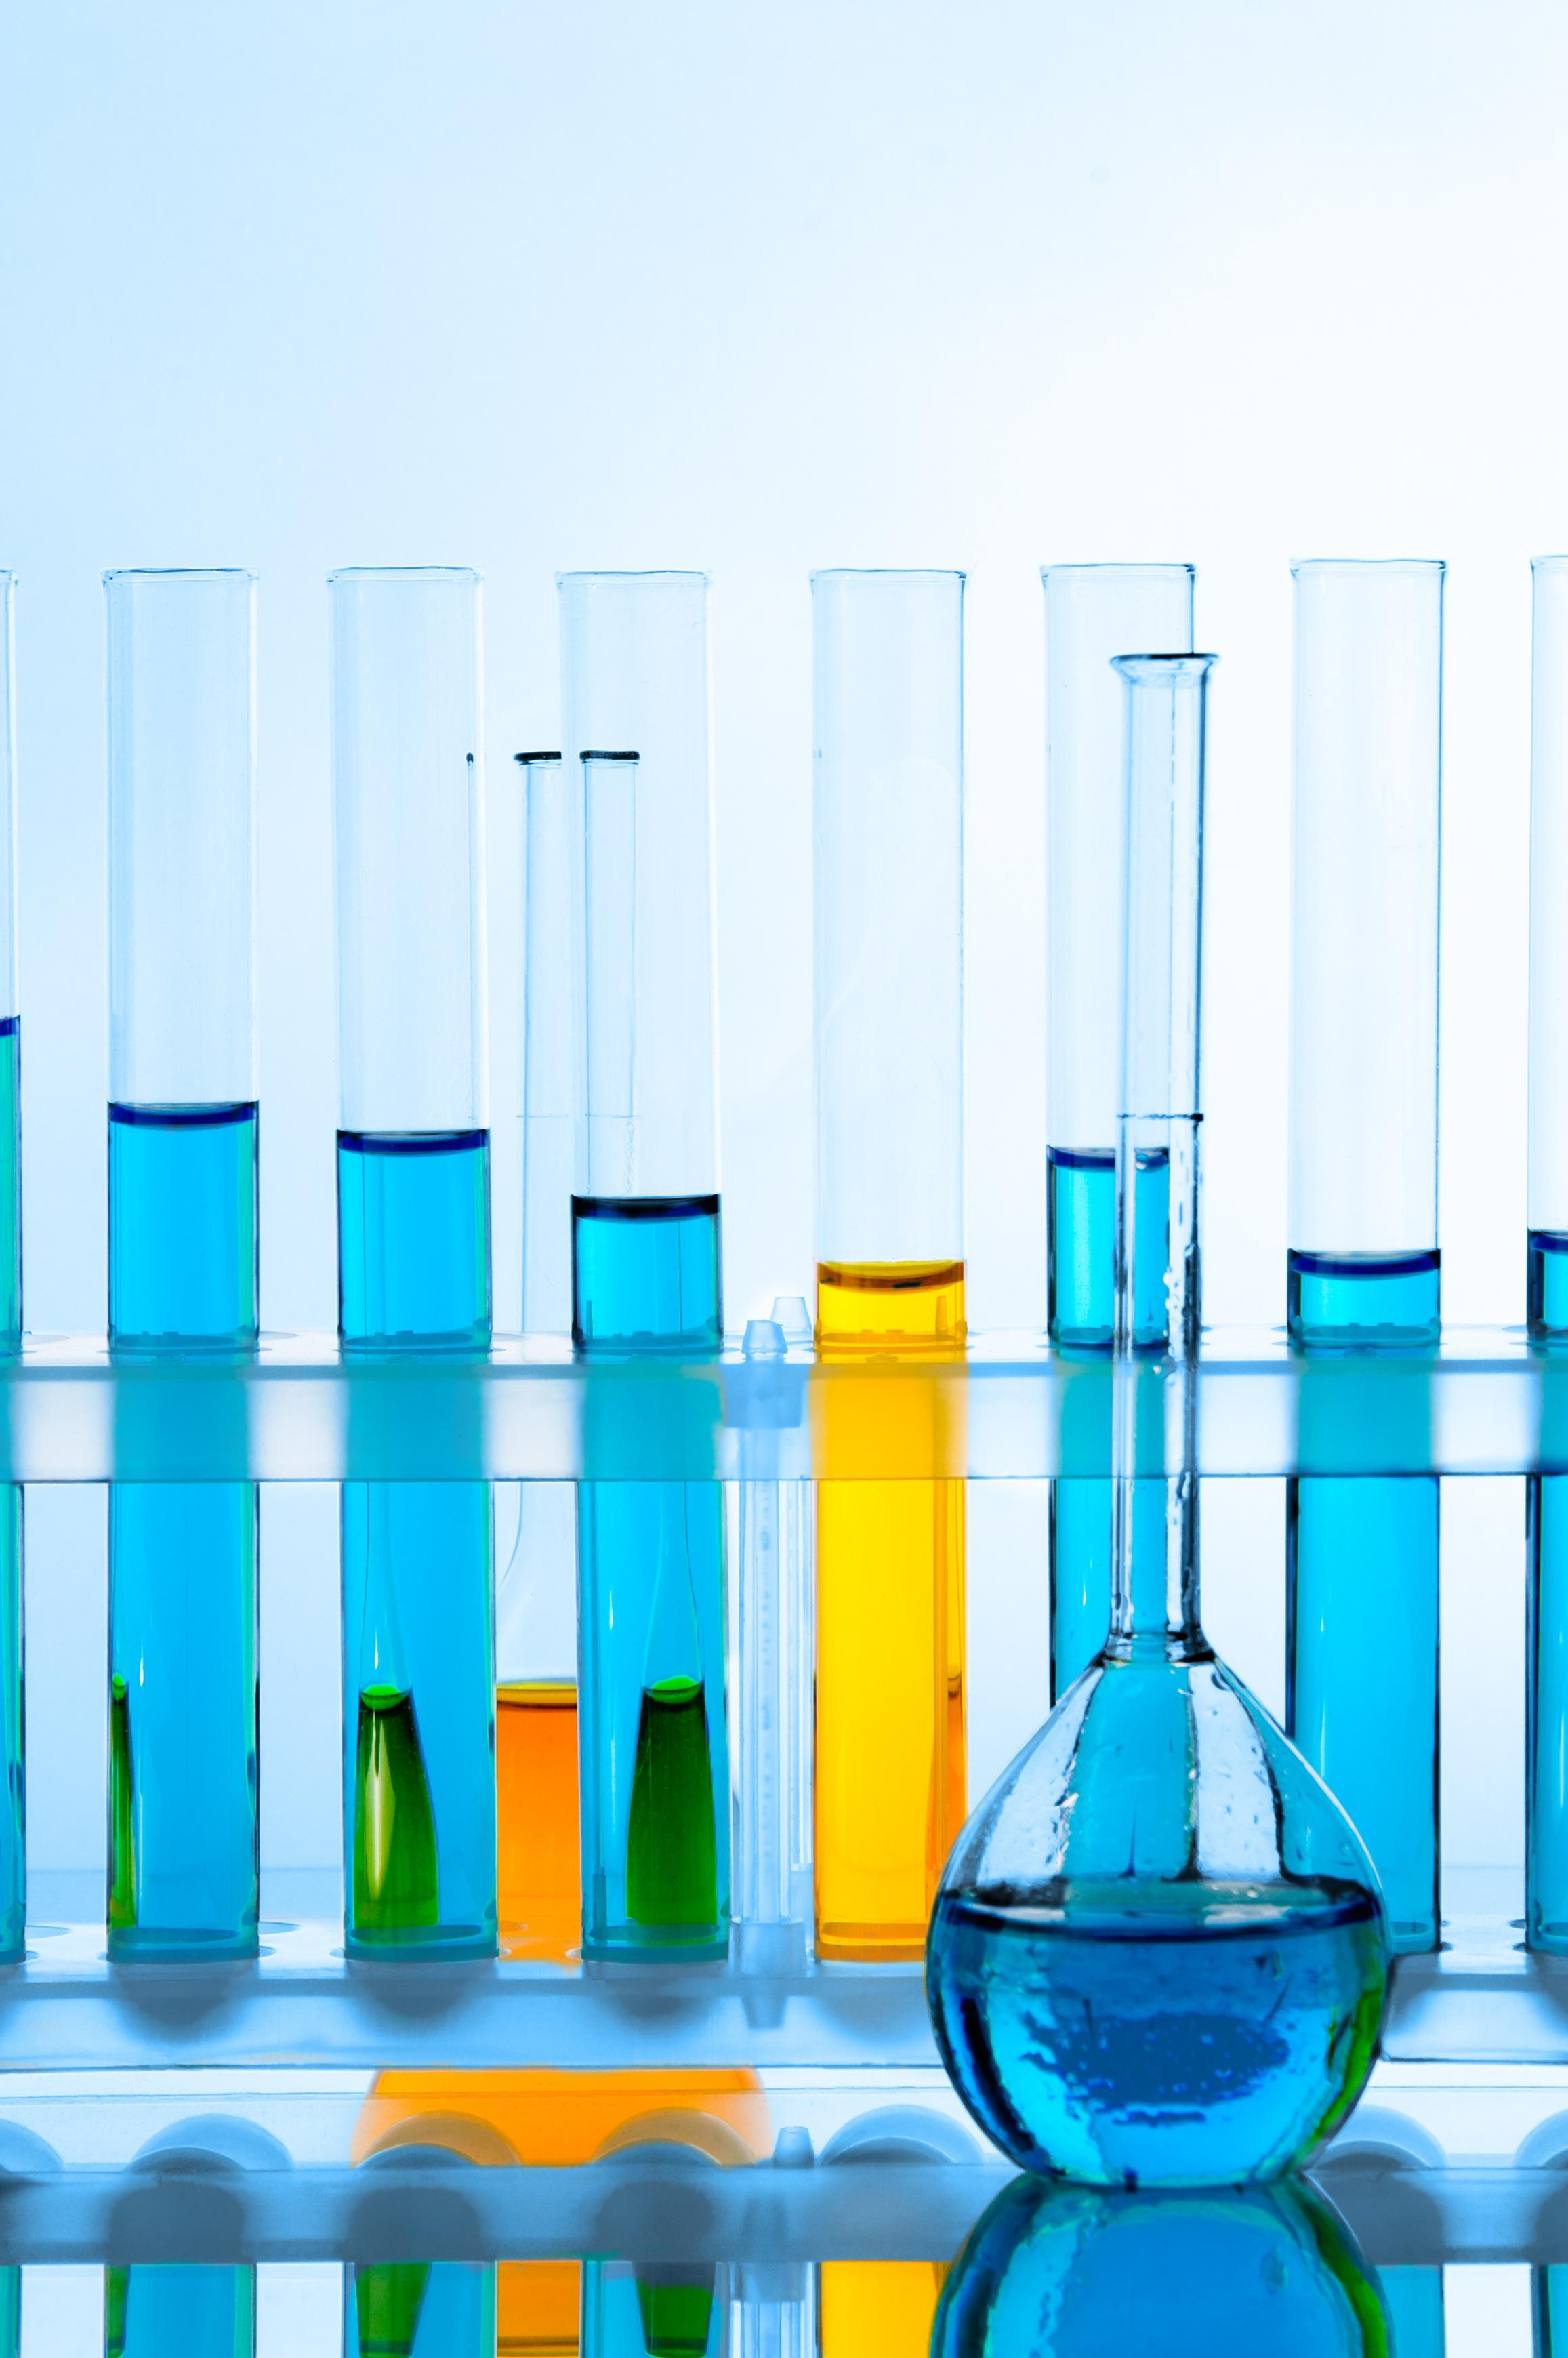 bigstock_Laboratory_Glassware_7117463.jpg